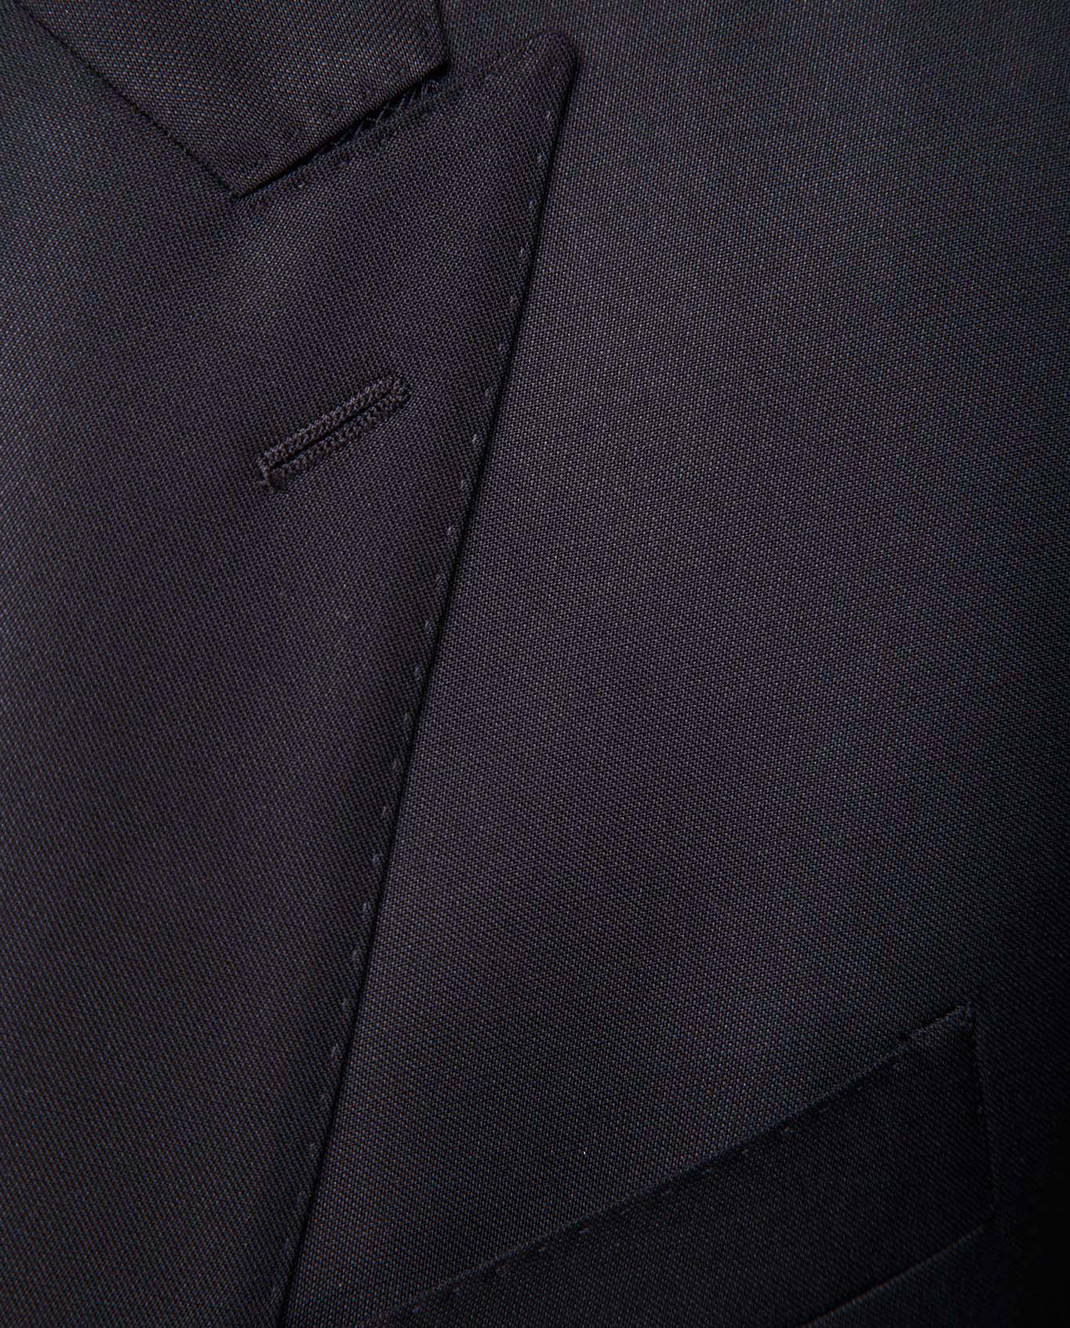 Dolce&Gabbana Черный костюм GK0RMTFU3N0 изображение 5